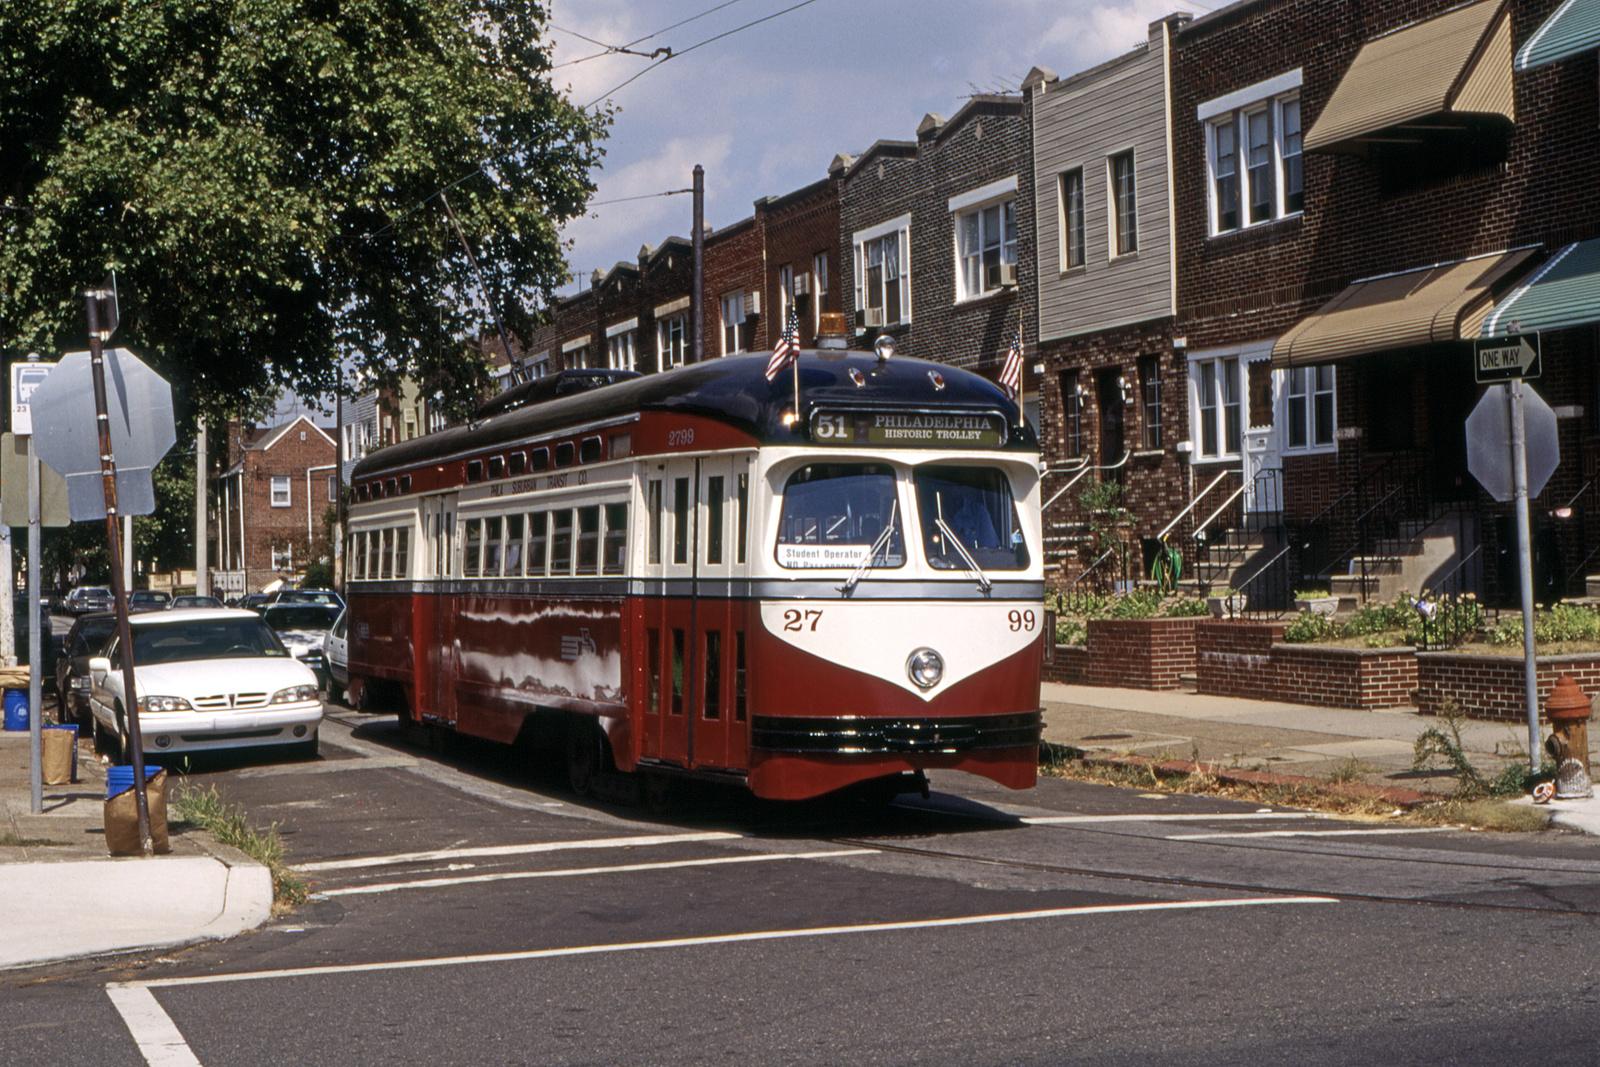 (1012k, 1600x1067)<br><b>Country:</b> United States<br><b>City:</b> Philadelphia, PA<br><b>System:</b> SEPTA (or Predecessor)<br><b>Line:</b> Rt. 23-Germantown<br><b>Location:</b> Marvine/Bigler<br><b>Car:</b> PTC/SEPTA Postwar All-electric PCC (St.Louis, 1947) 2799 <br><b>Collection of:</b> David Pirmann<br><b>Date:</b> 9/1995<br><b>Viewed (this week/total):</b> 0 / 105